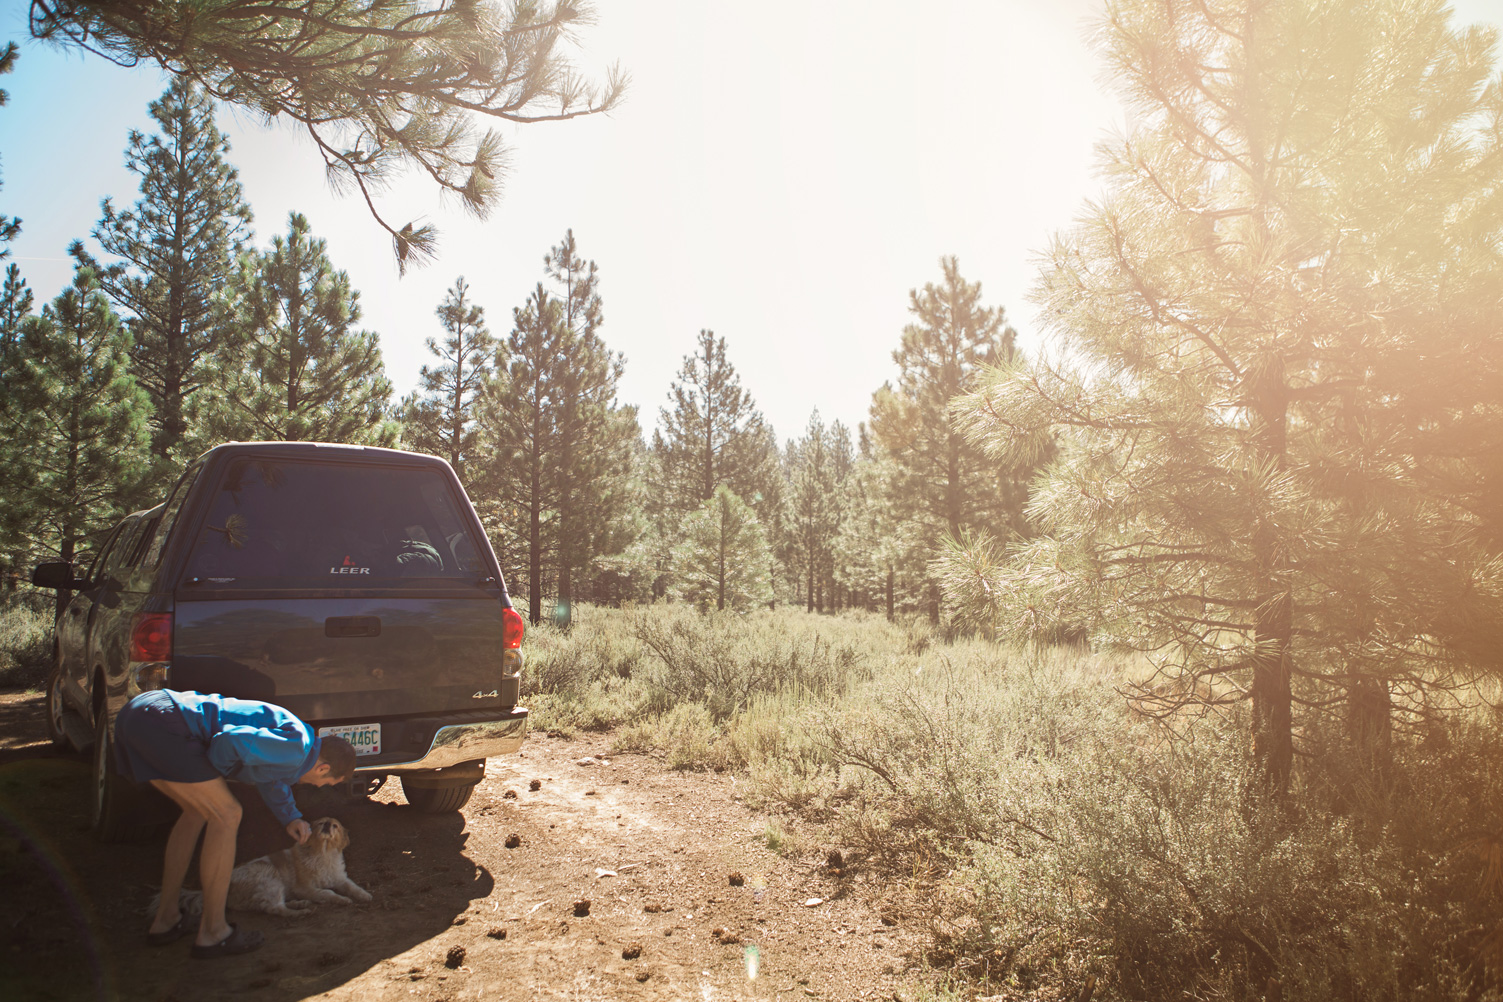 CindyGiovagnoli_California_Nevada_photographer_NevadaCity_PerseidMeteorShower_StampedeReservoir_truck_camping_VirginiaCity_MarkTwain_sunset-022.jpg